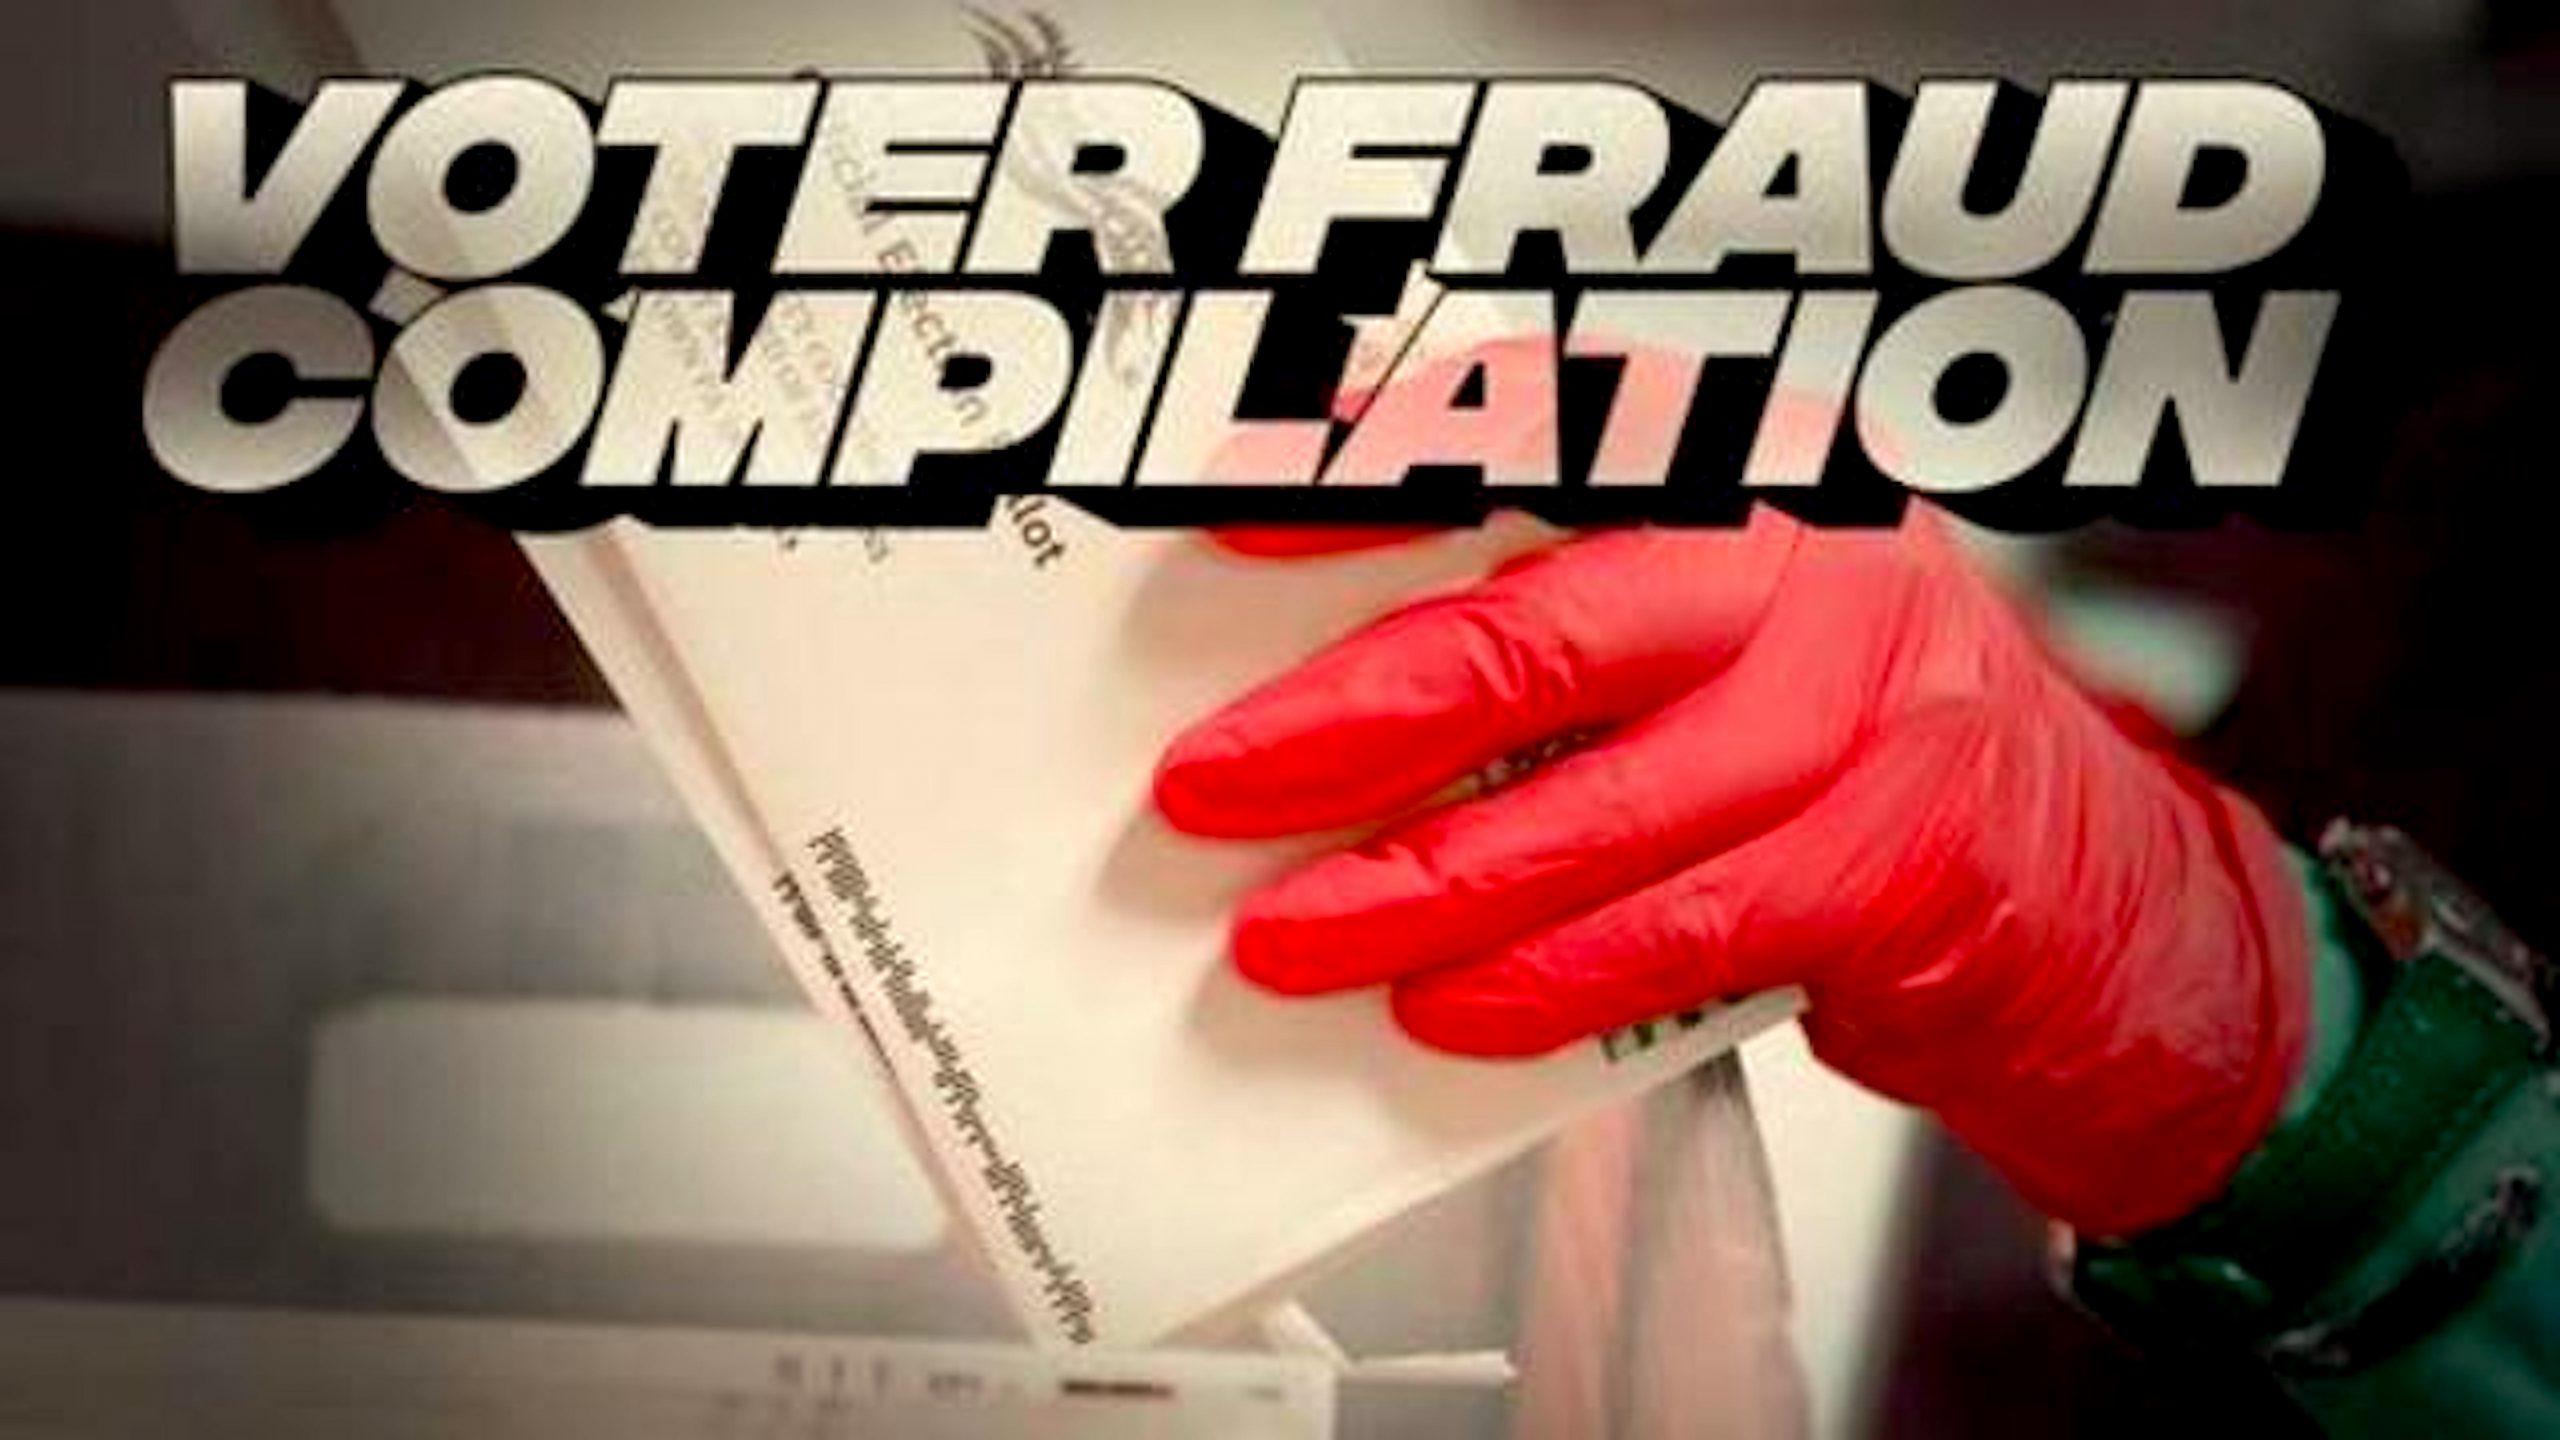 Epic Voter Fraud Compilation (foto Bitchute)